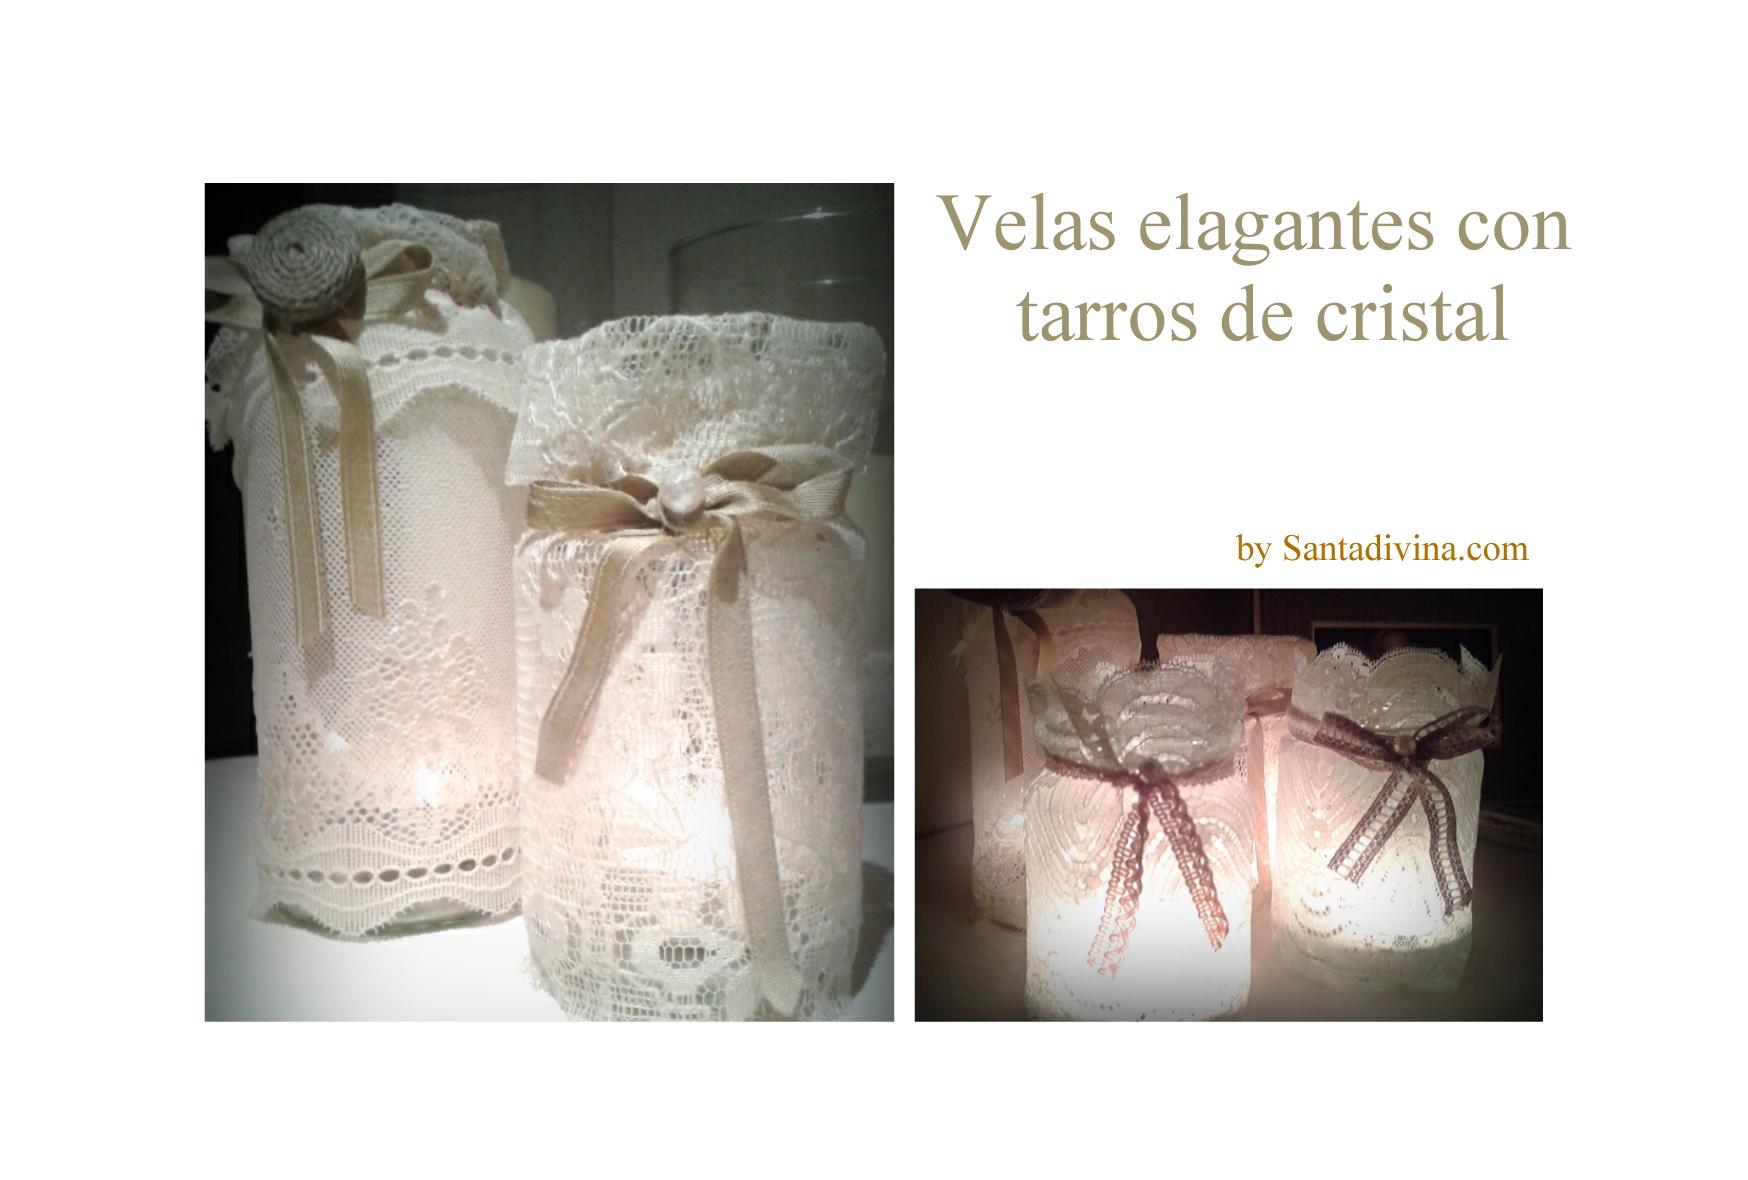 Portavelas con tarros de cristal santadivina - Portavelas cristal ...